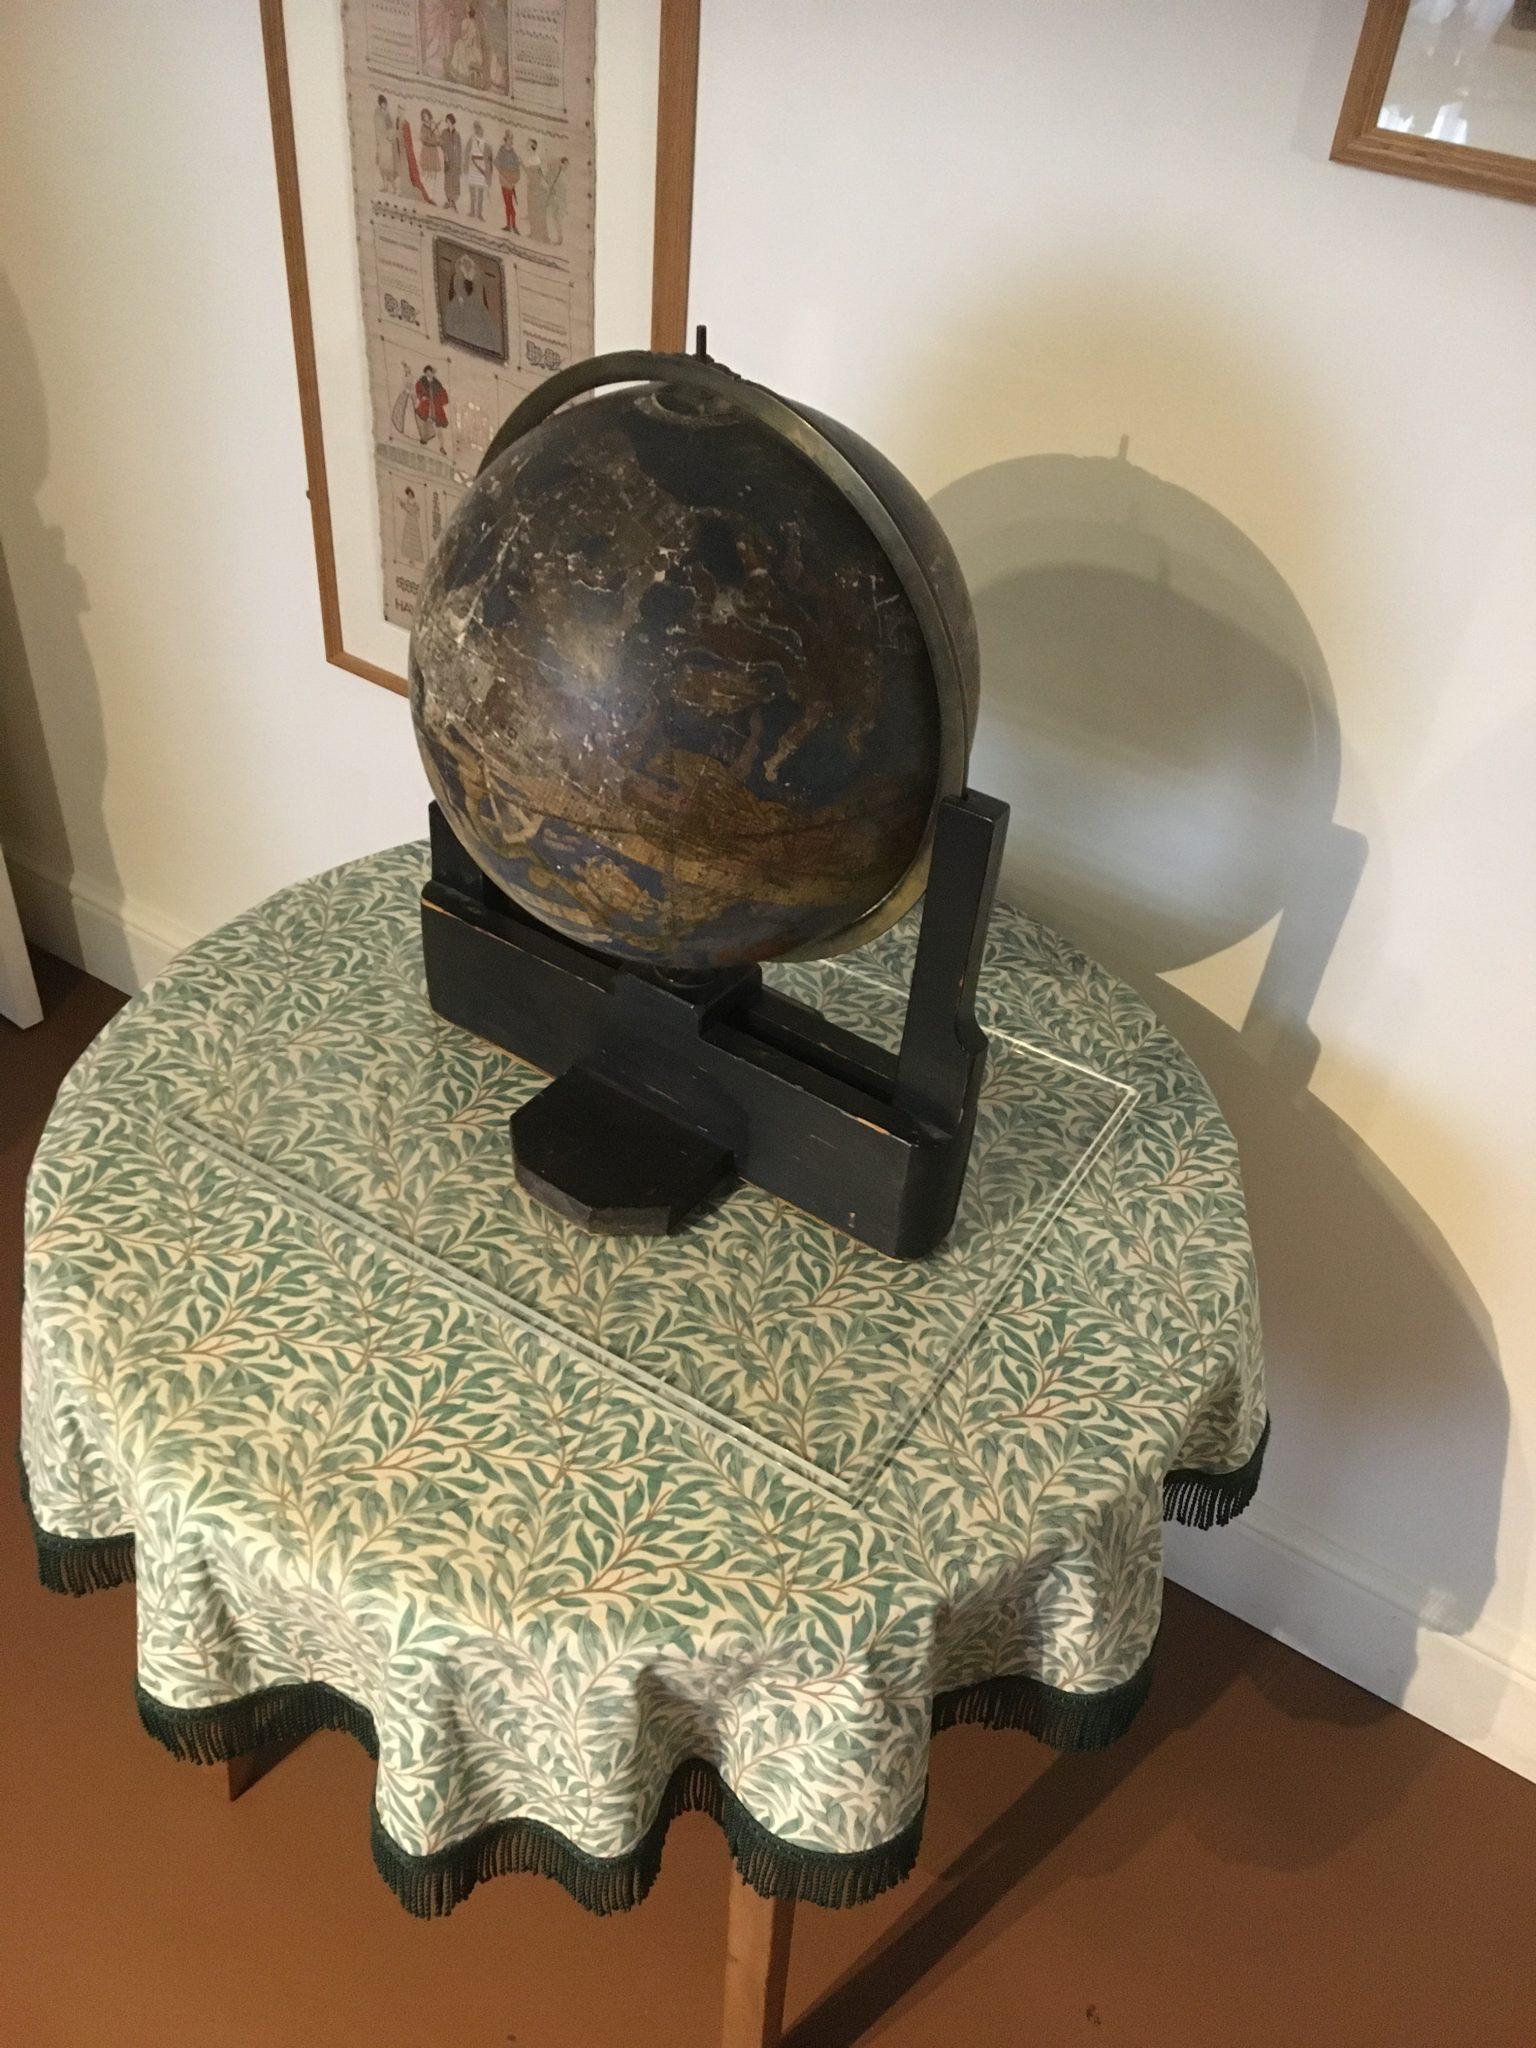 Pilgrim Trust Conservation Grant – Holst Birthplace Museum